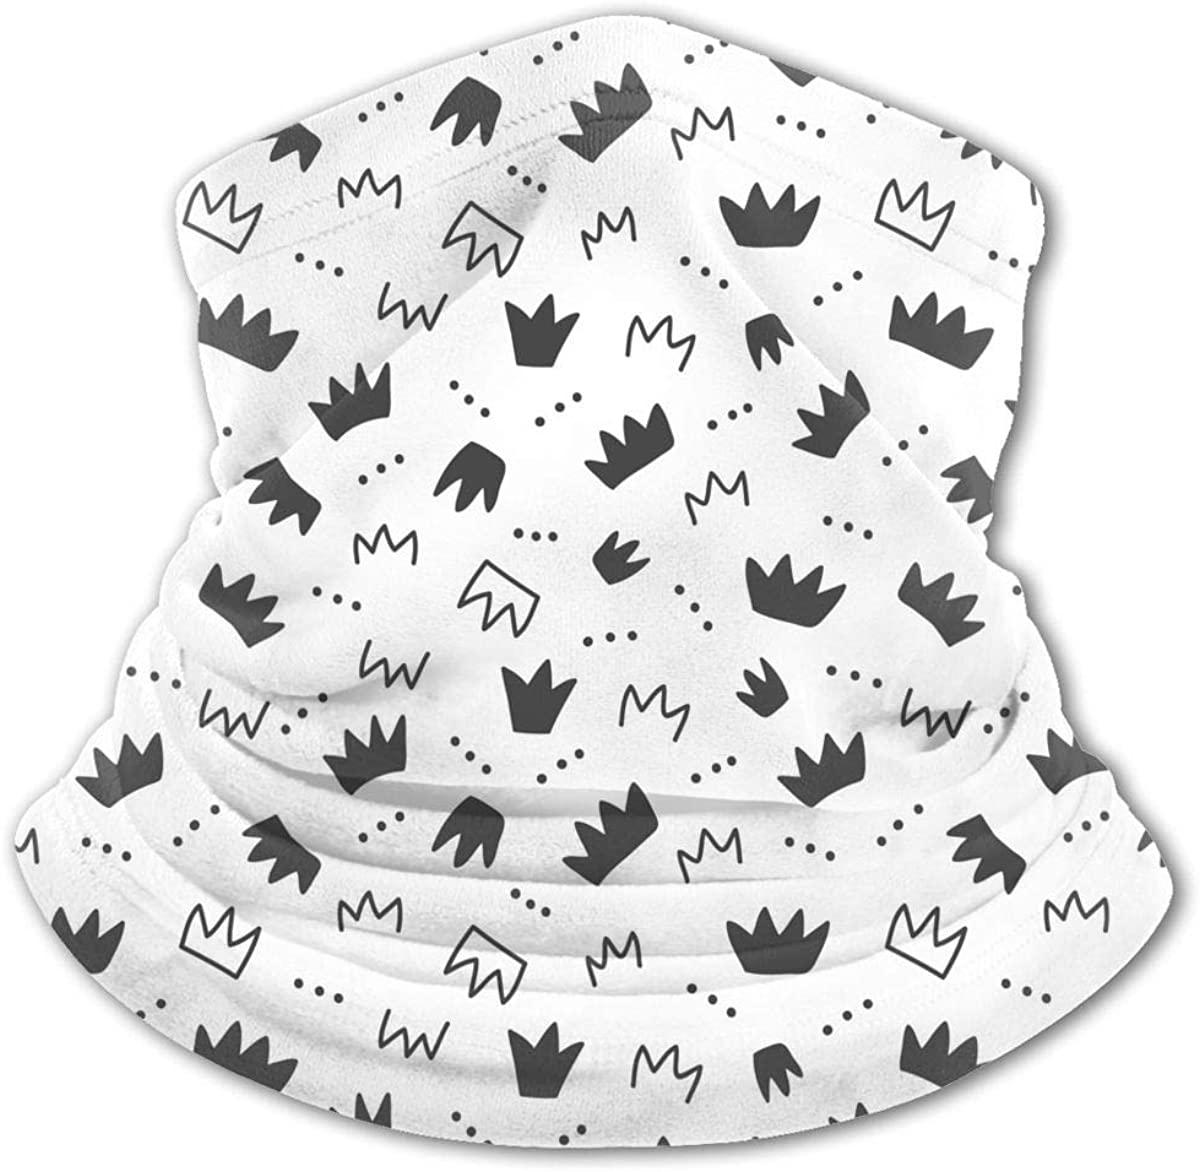 Hand Drawn Crowns Neck Gaiter Balaclava Bandana Headwear Cooling Scarf Variety Face Towel